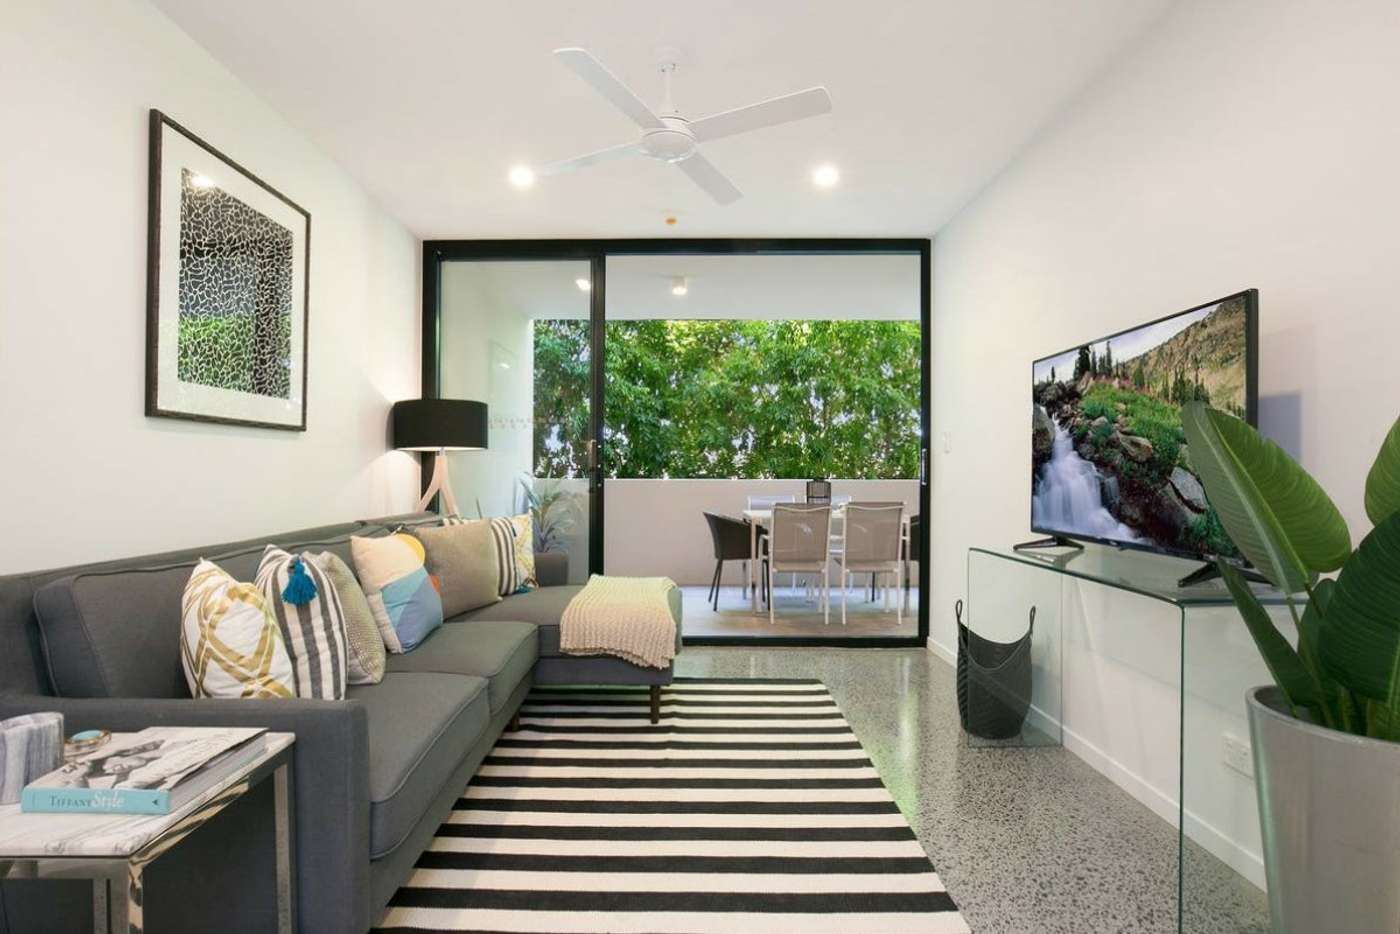 Main view of Homely unit listing, 105/27 Ekibin Road, Annerley QLD 4103